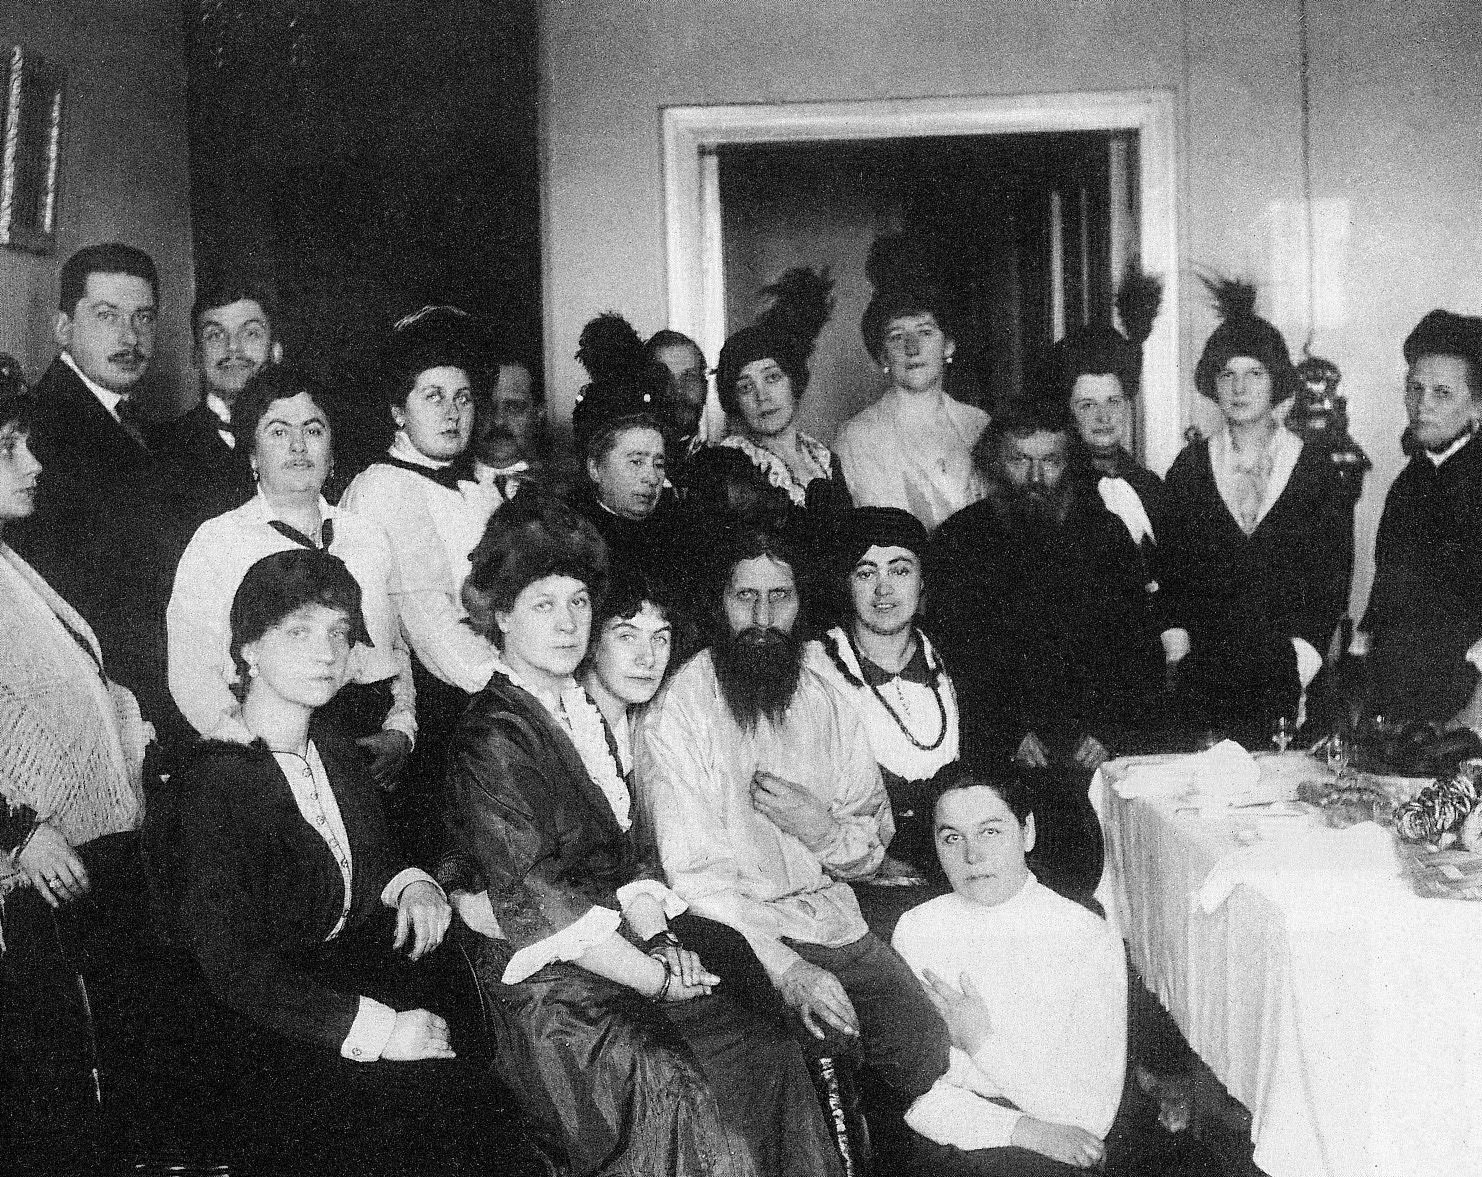 Г. Распутин с поклонницами. https://de.wikipedia.org/